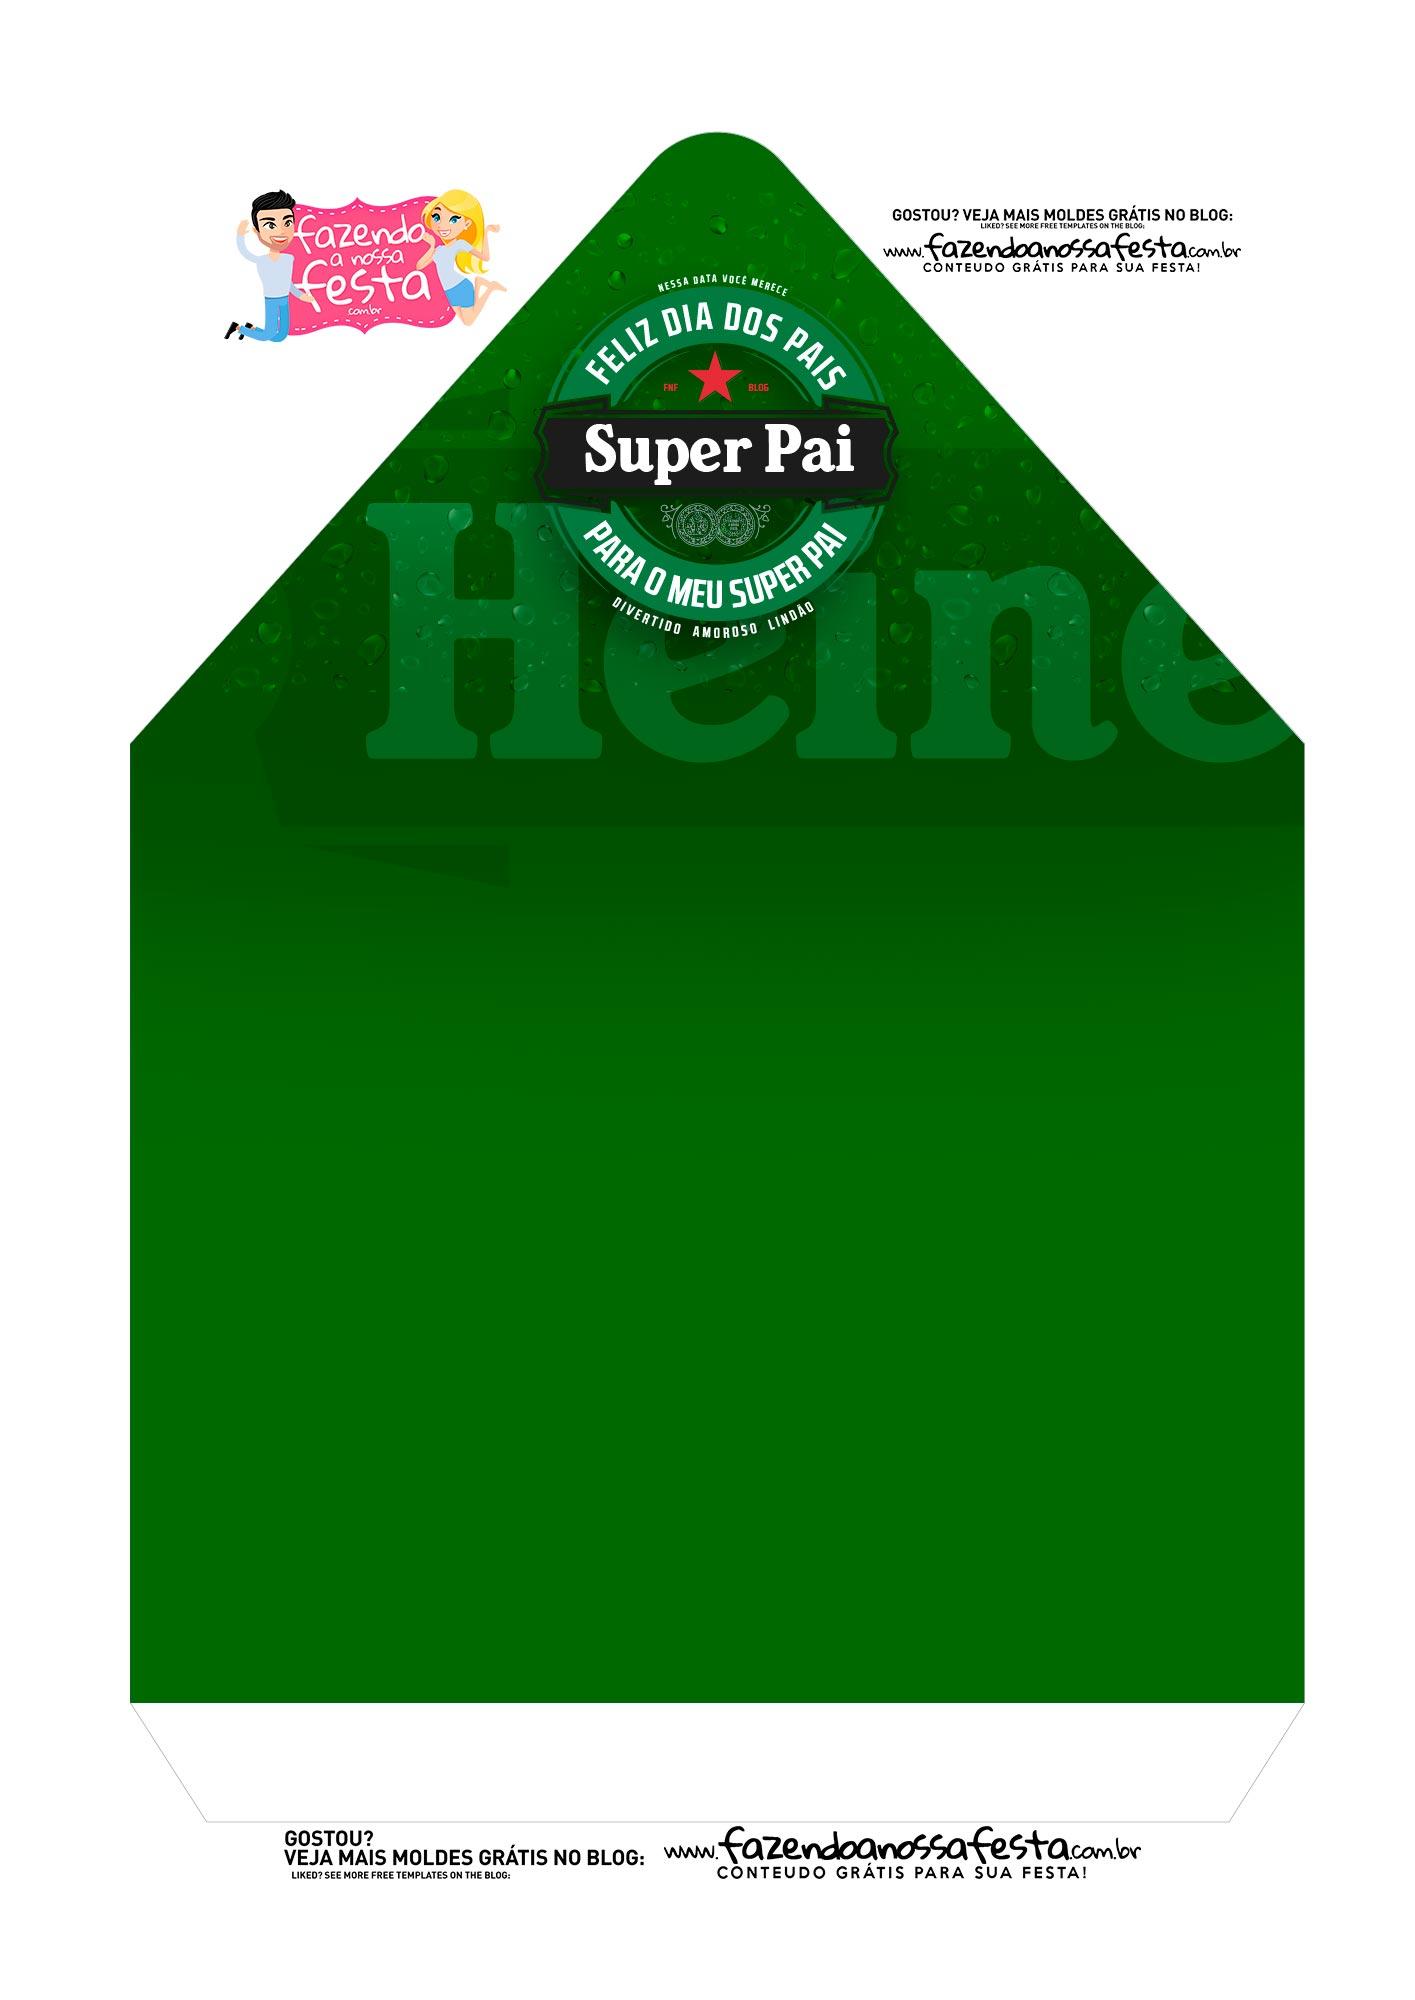 Caixa Envelope Heineken 2